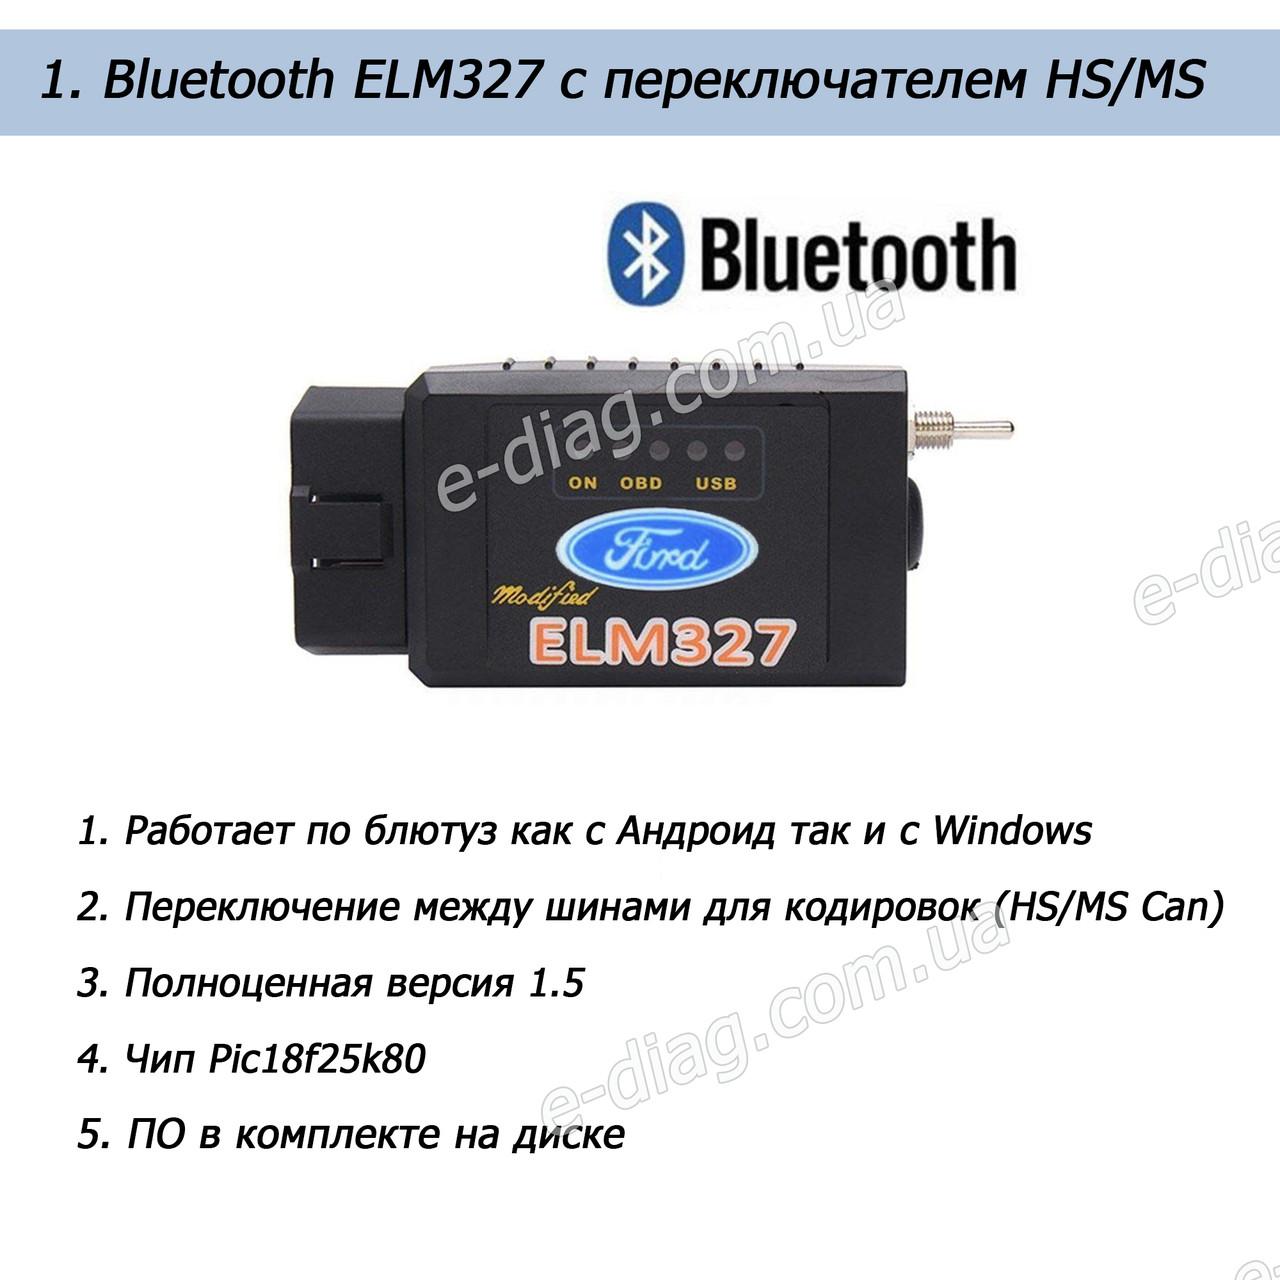 Діагностичний сканер адаптер ELM327 для Ford, Mazda Bluetooth v1.5 з перемикачем (форд блютус)